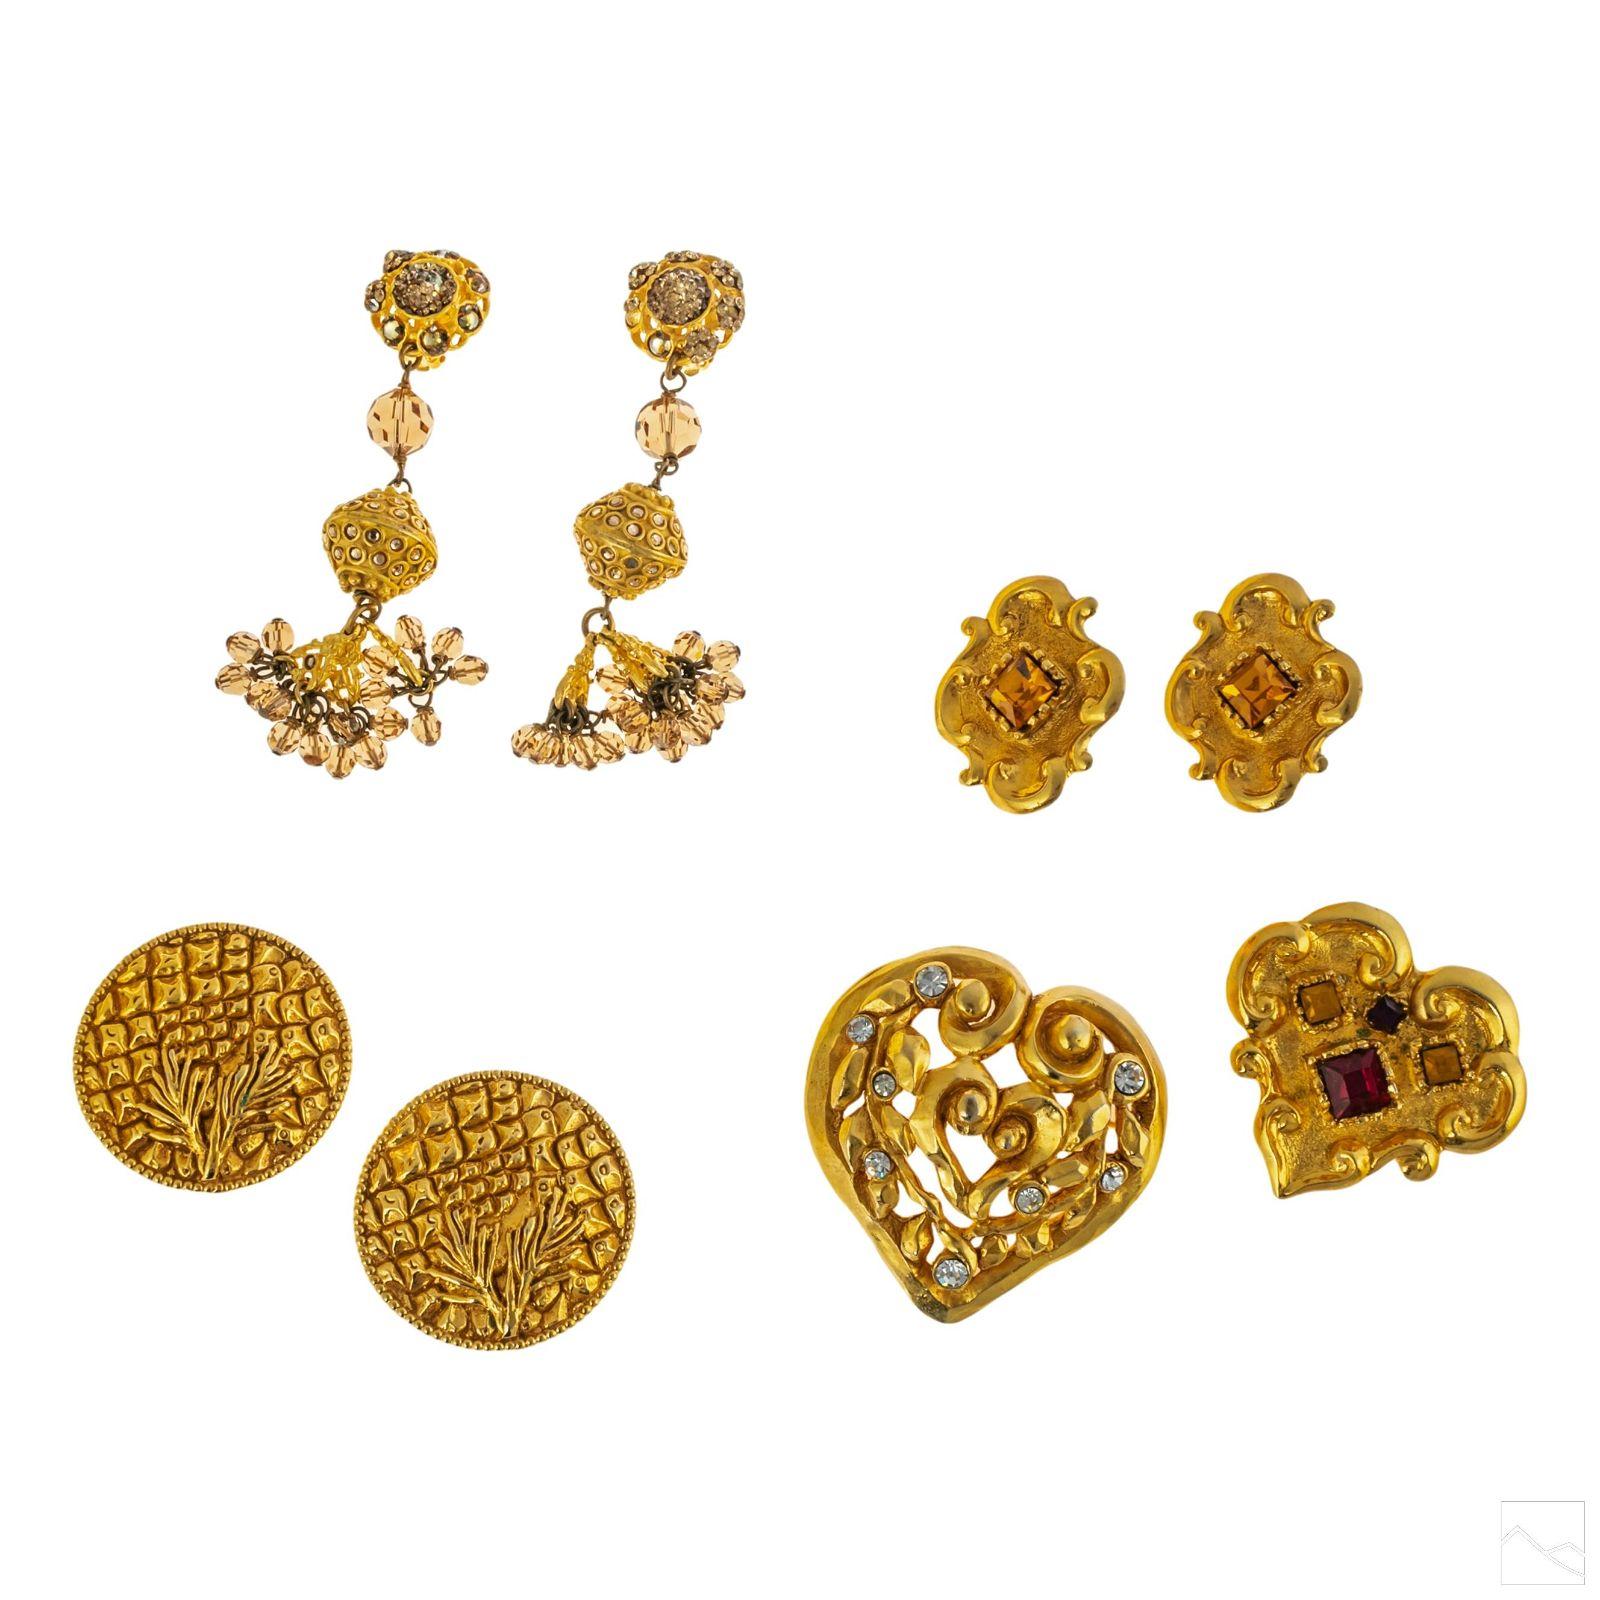 Designer Vintage Clip On Earring & Brooch Pins LOT